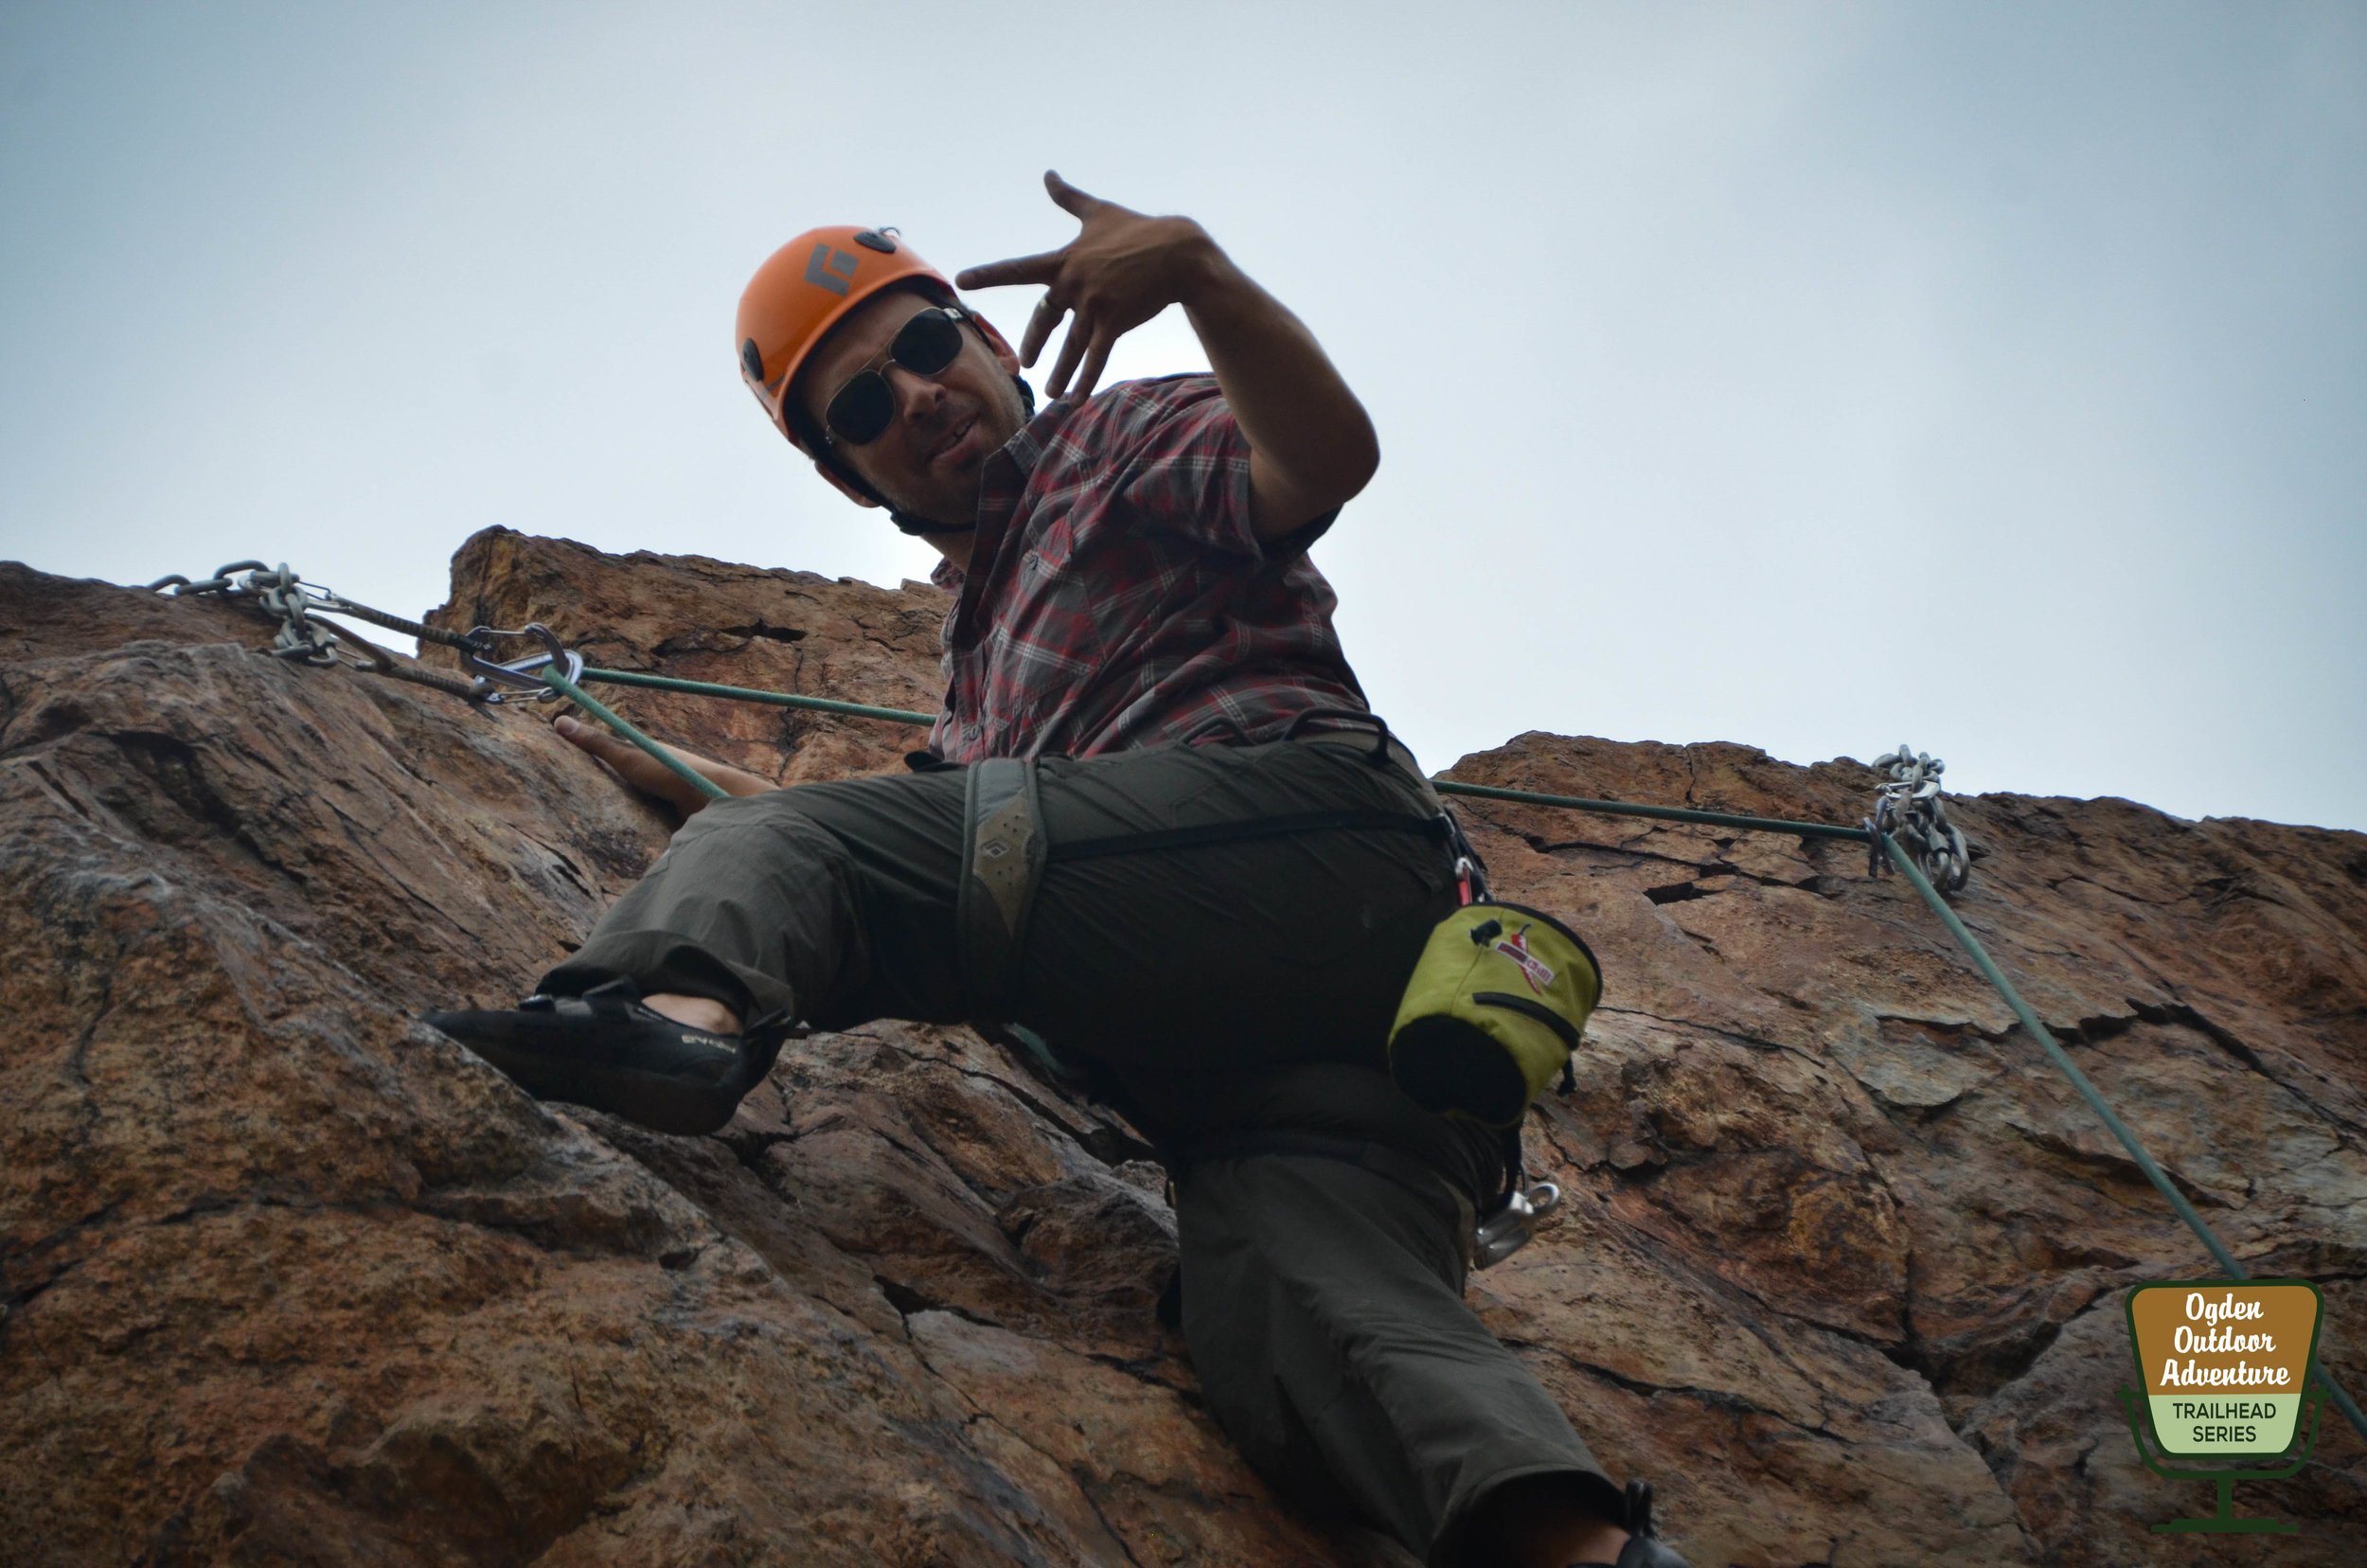 Ogden Outdoor Adventure Show 248 - Bear House Mountaineering-25.jpg